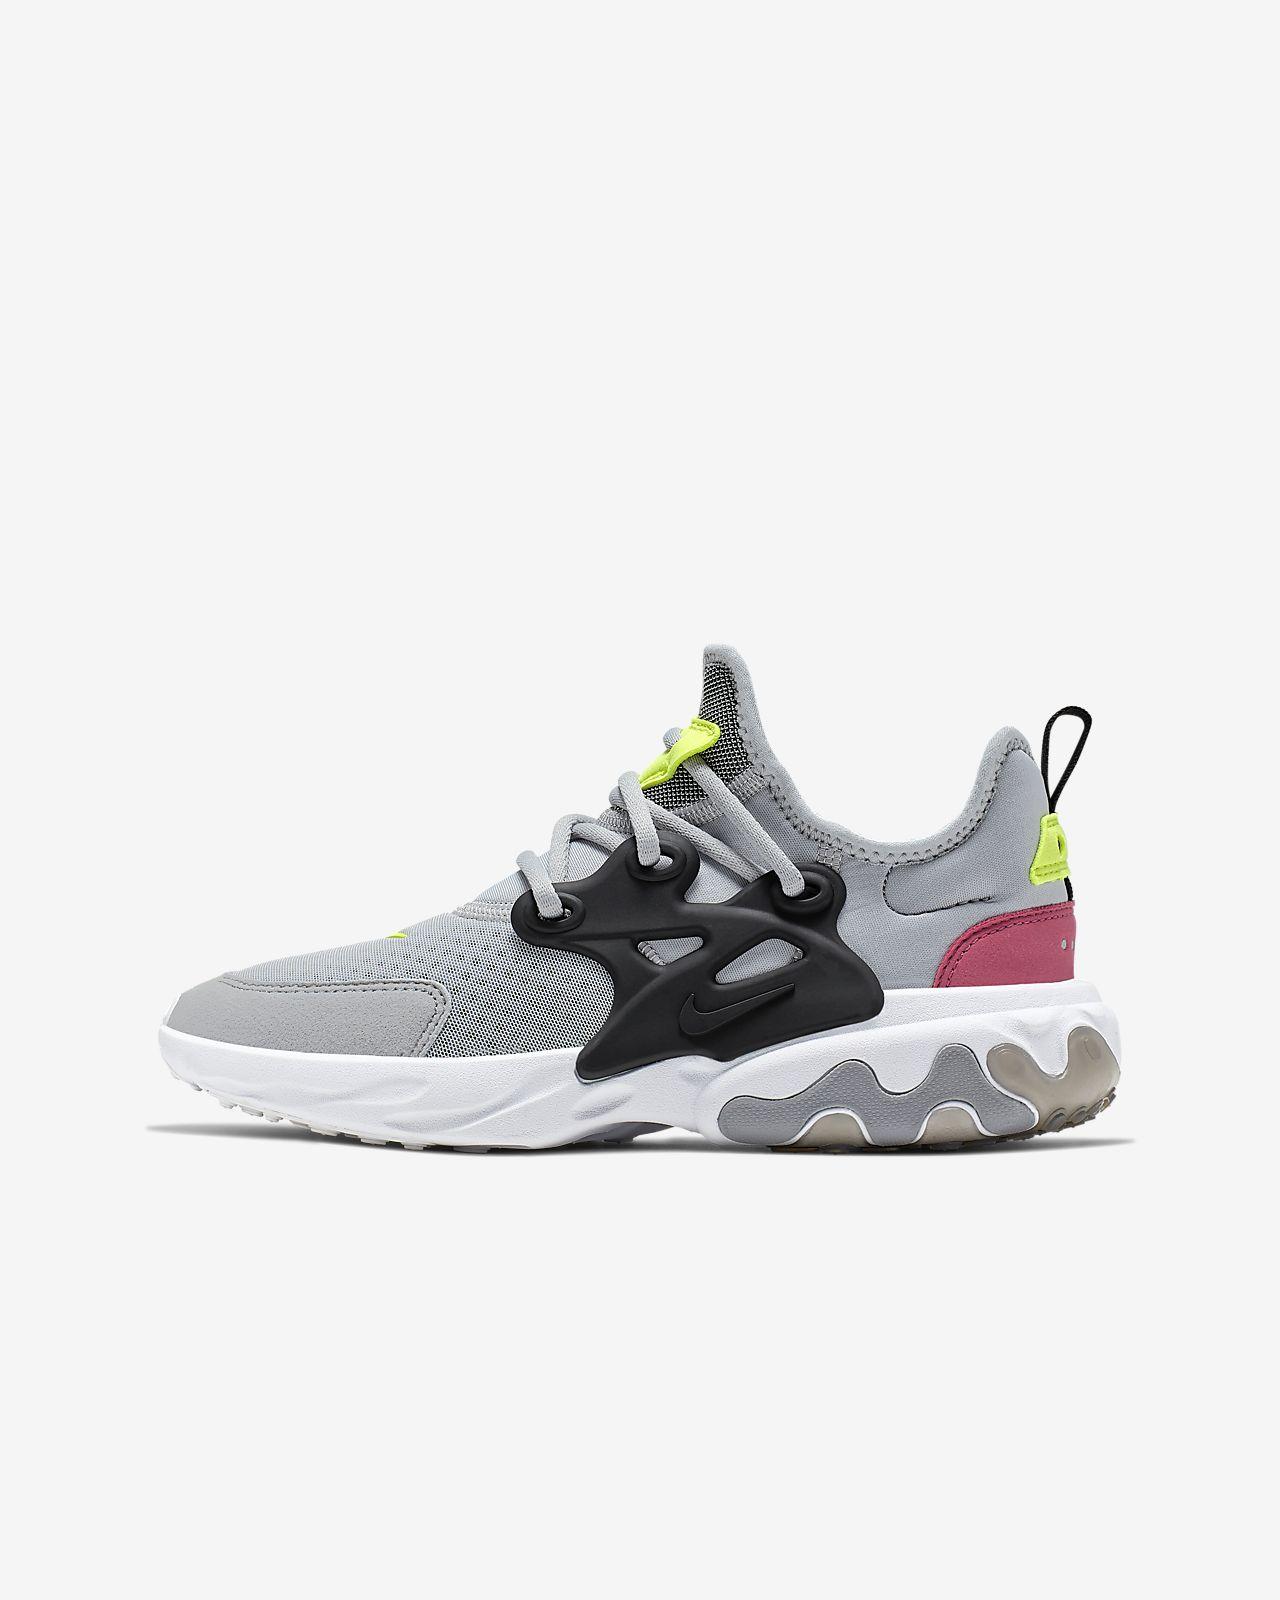 Sapatilhas Nike React Presto Júnior